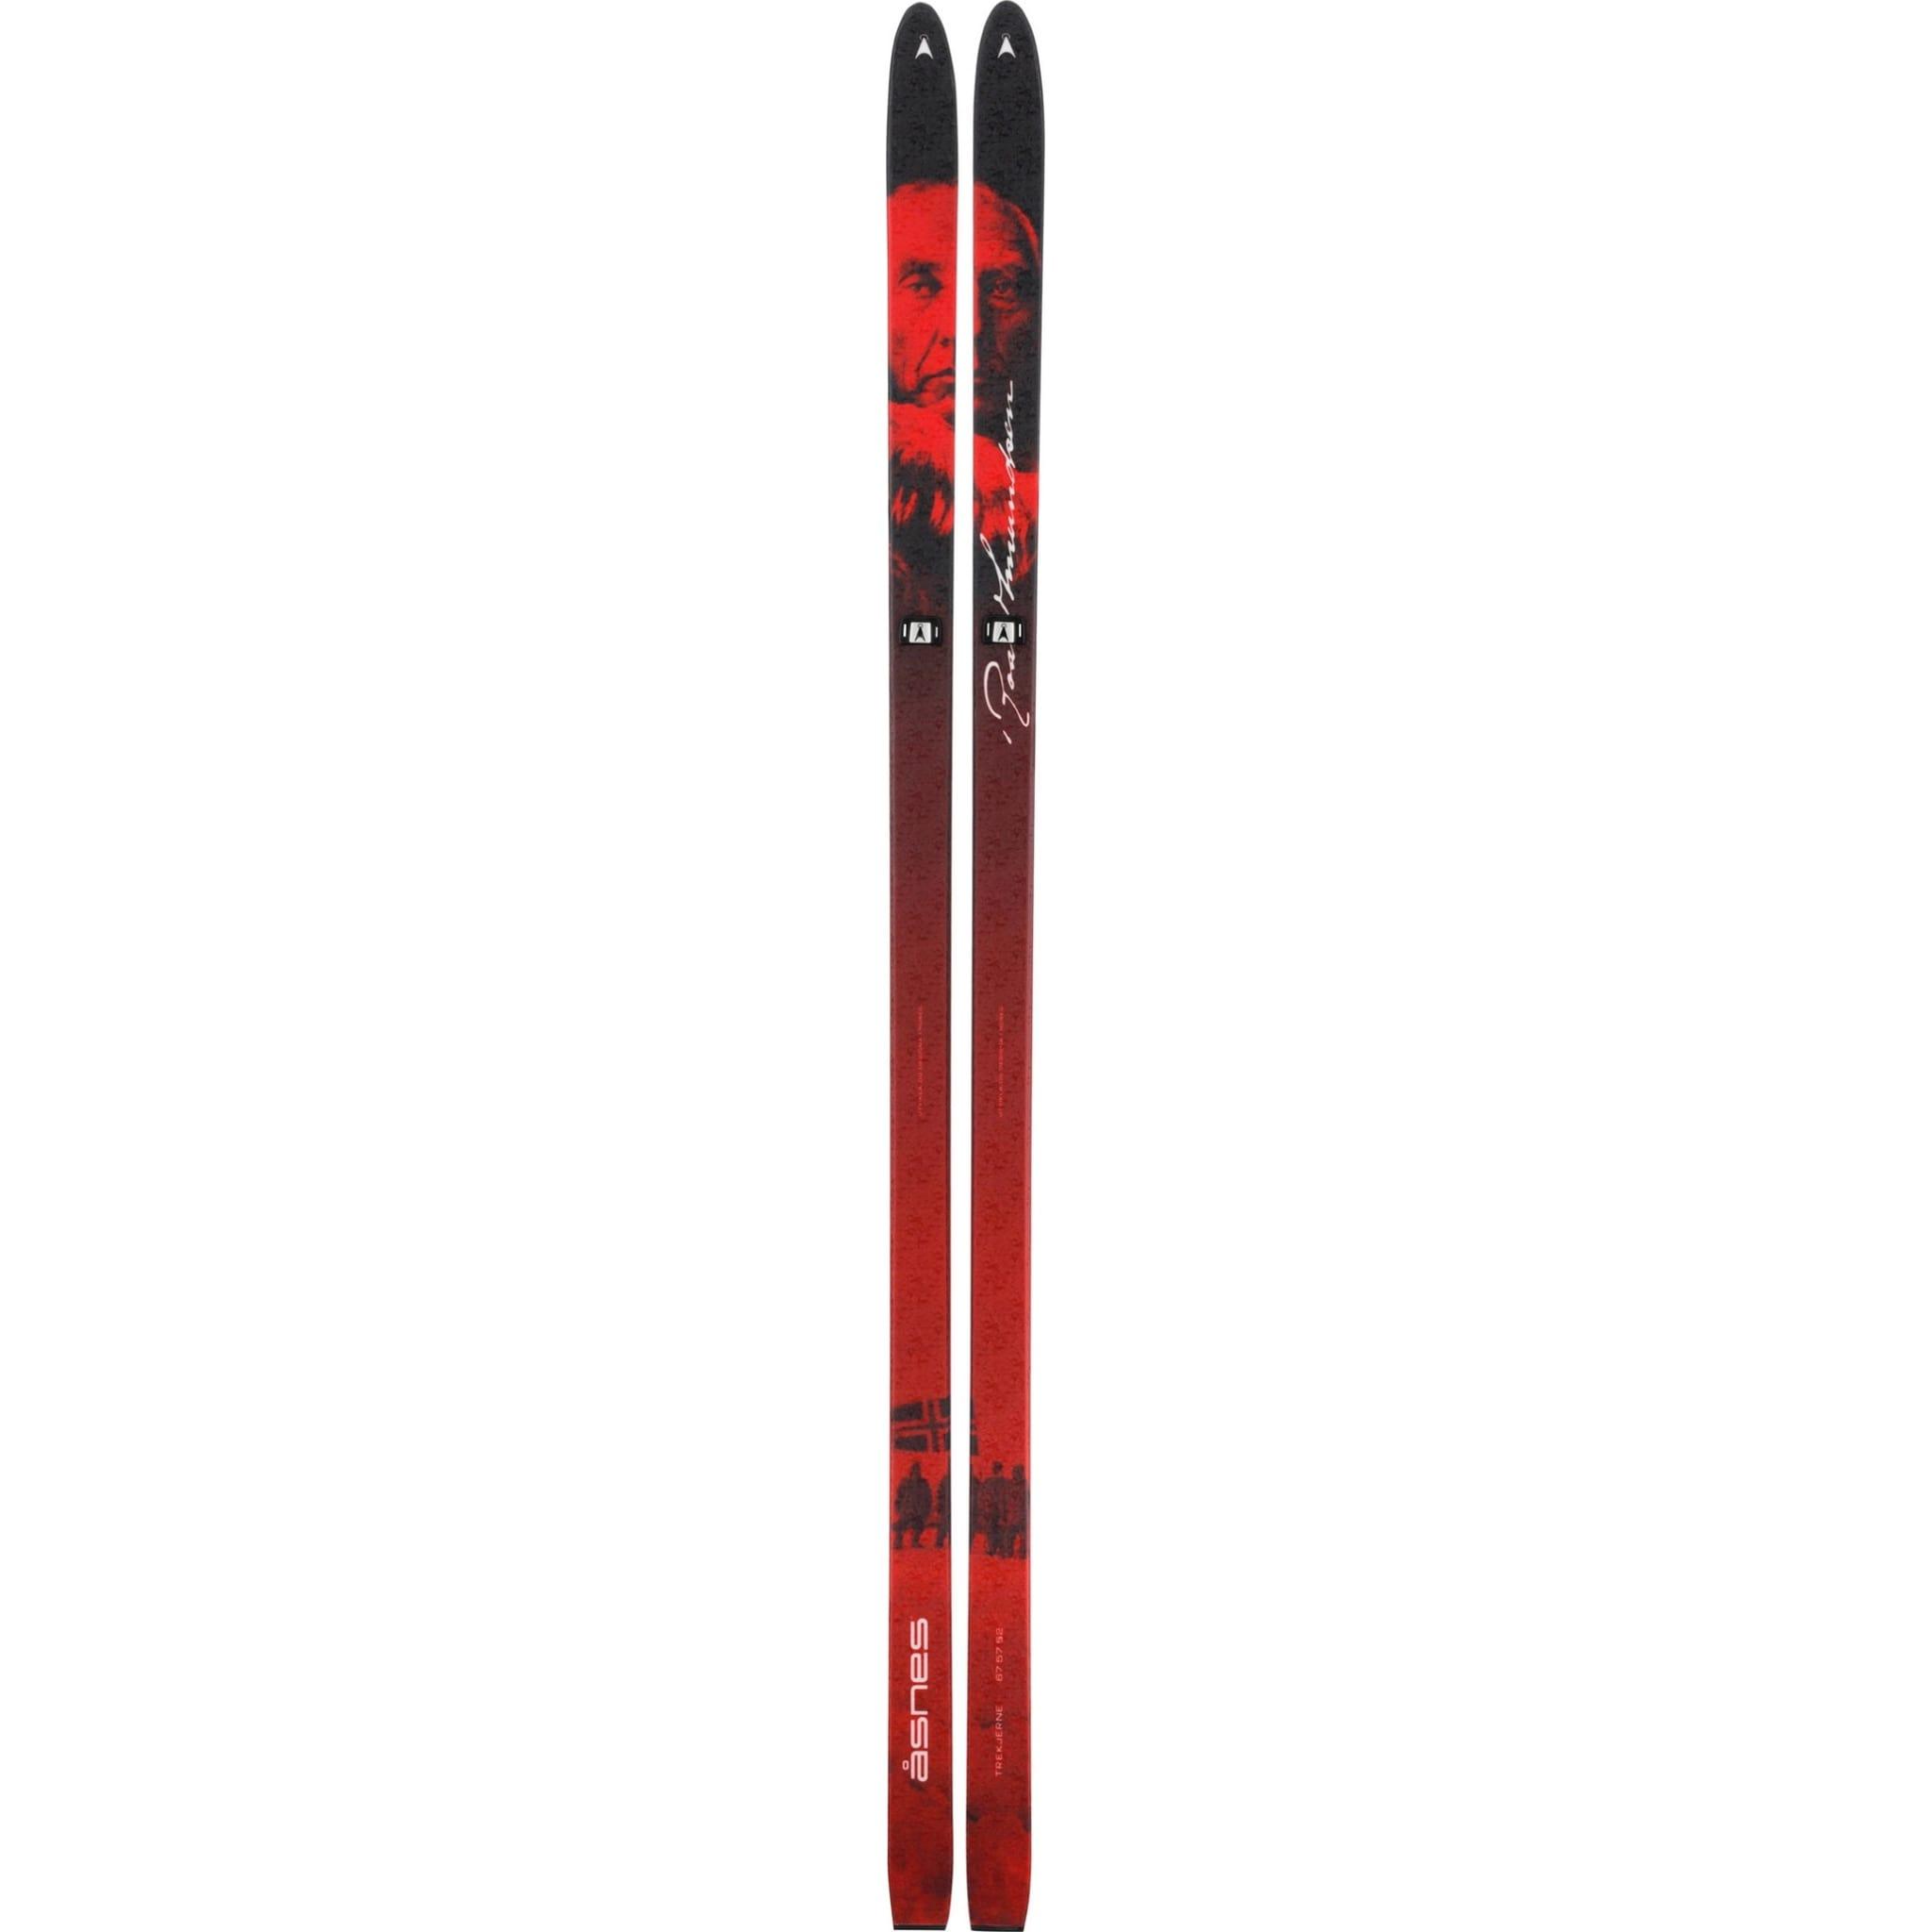 Optimal ski for lange turer på vidda med mye last